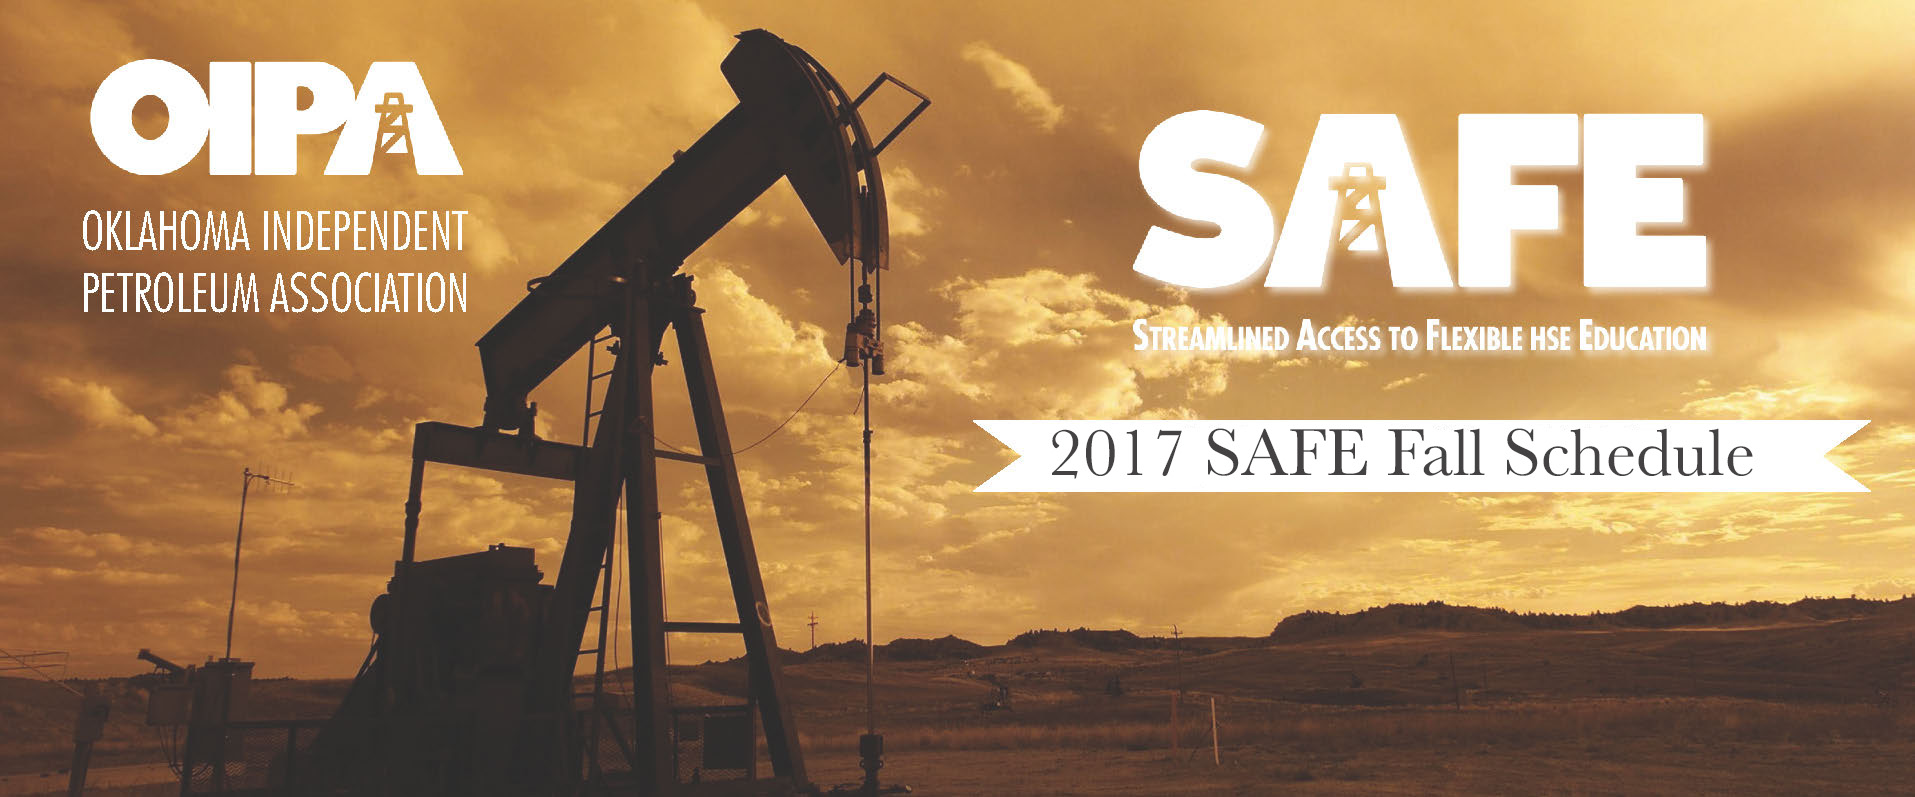 OIPA Fall 2017 SAFE Schedule